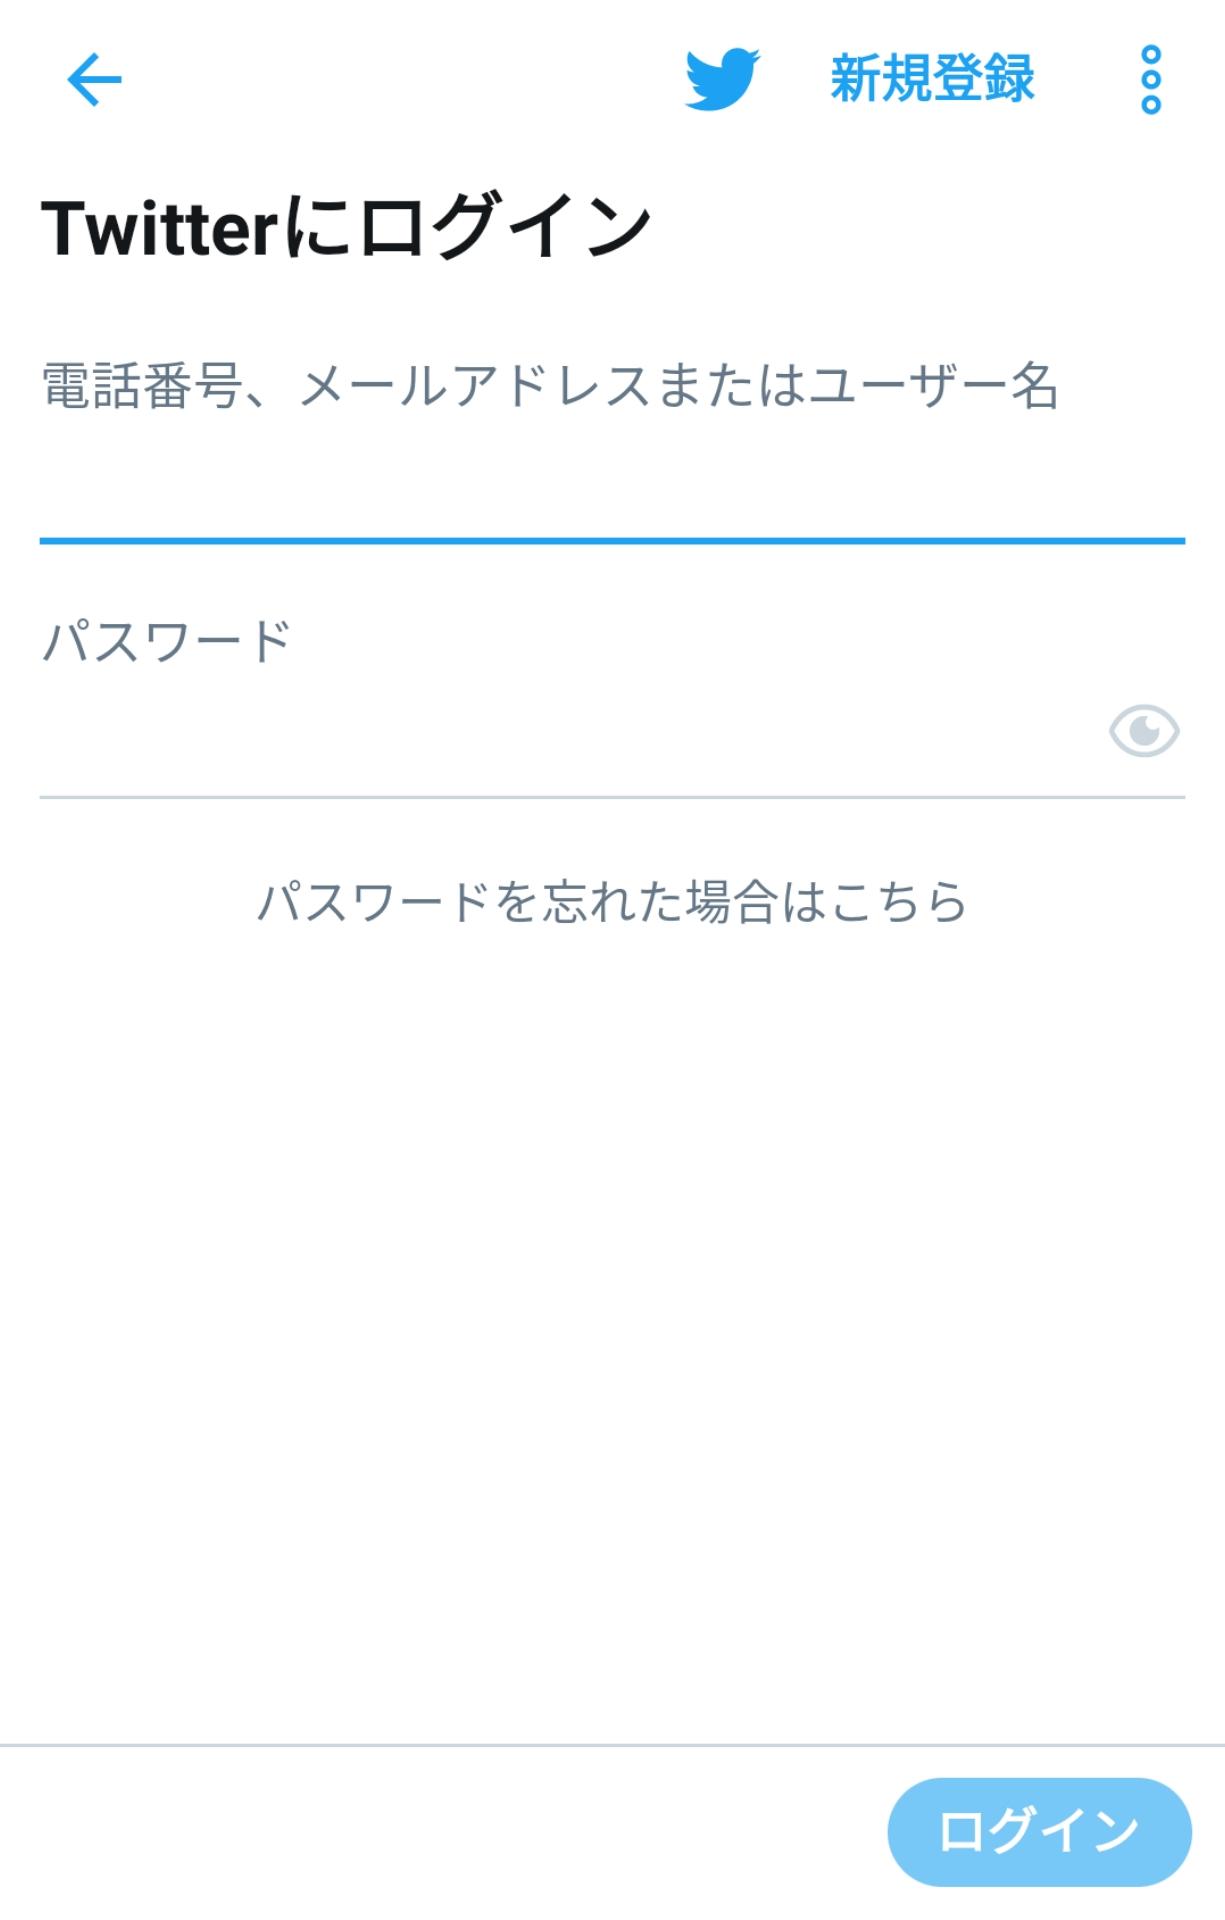 Twitter 機種変更 新しい端末 ログイン画面